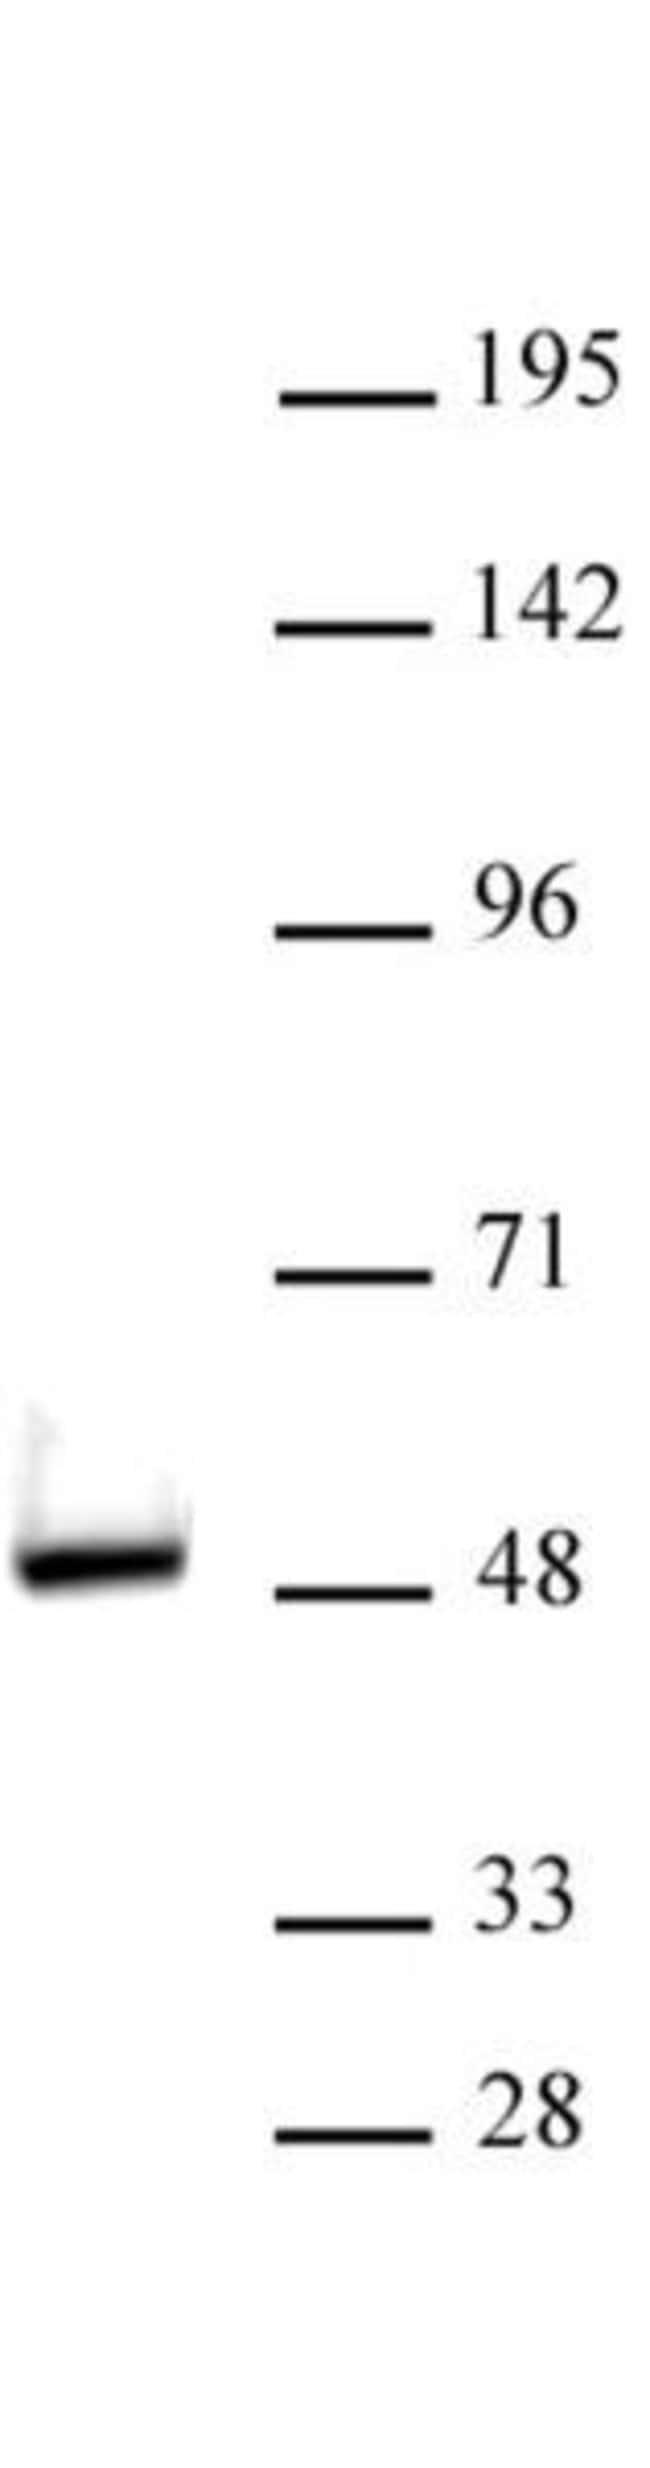 VDR Rabbit anti-Human, Unconjugated, Polyclonal, Active Motif:Antibodies:Primary